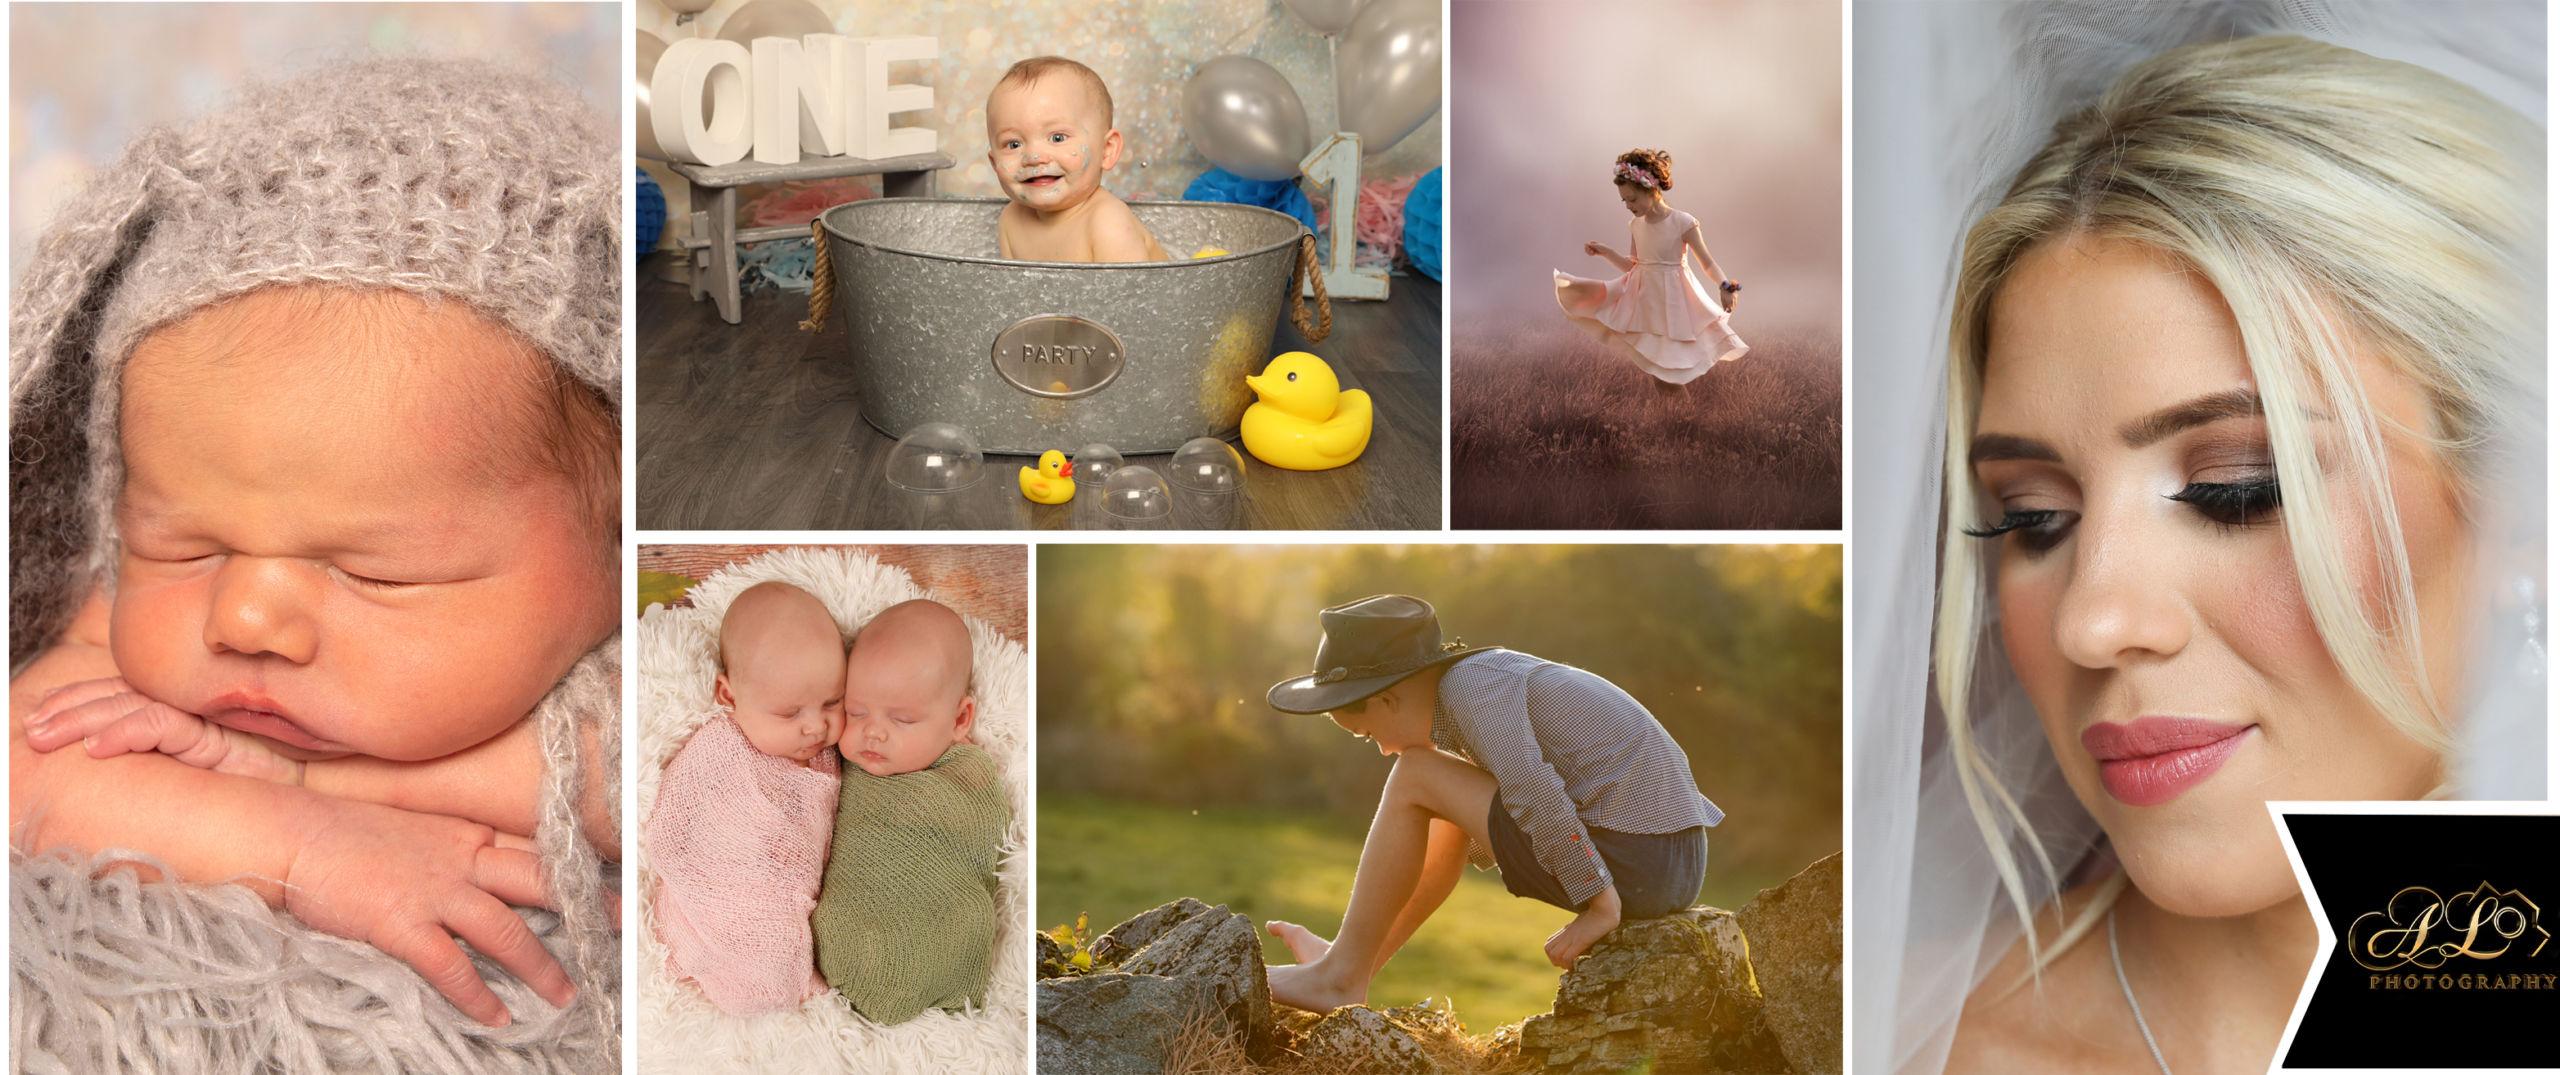 Collage of photoshoot